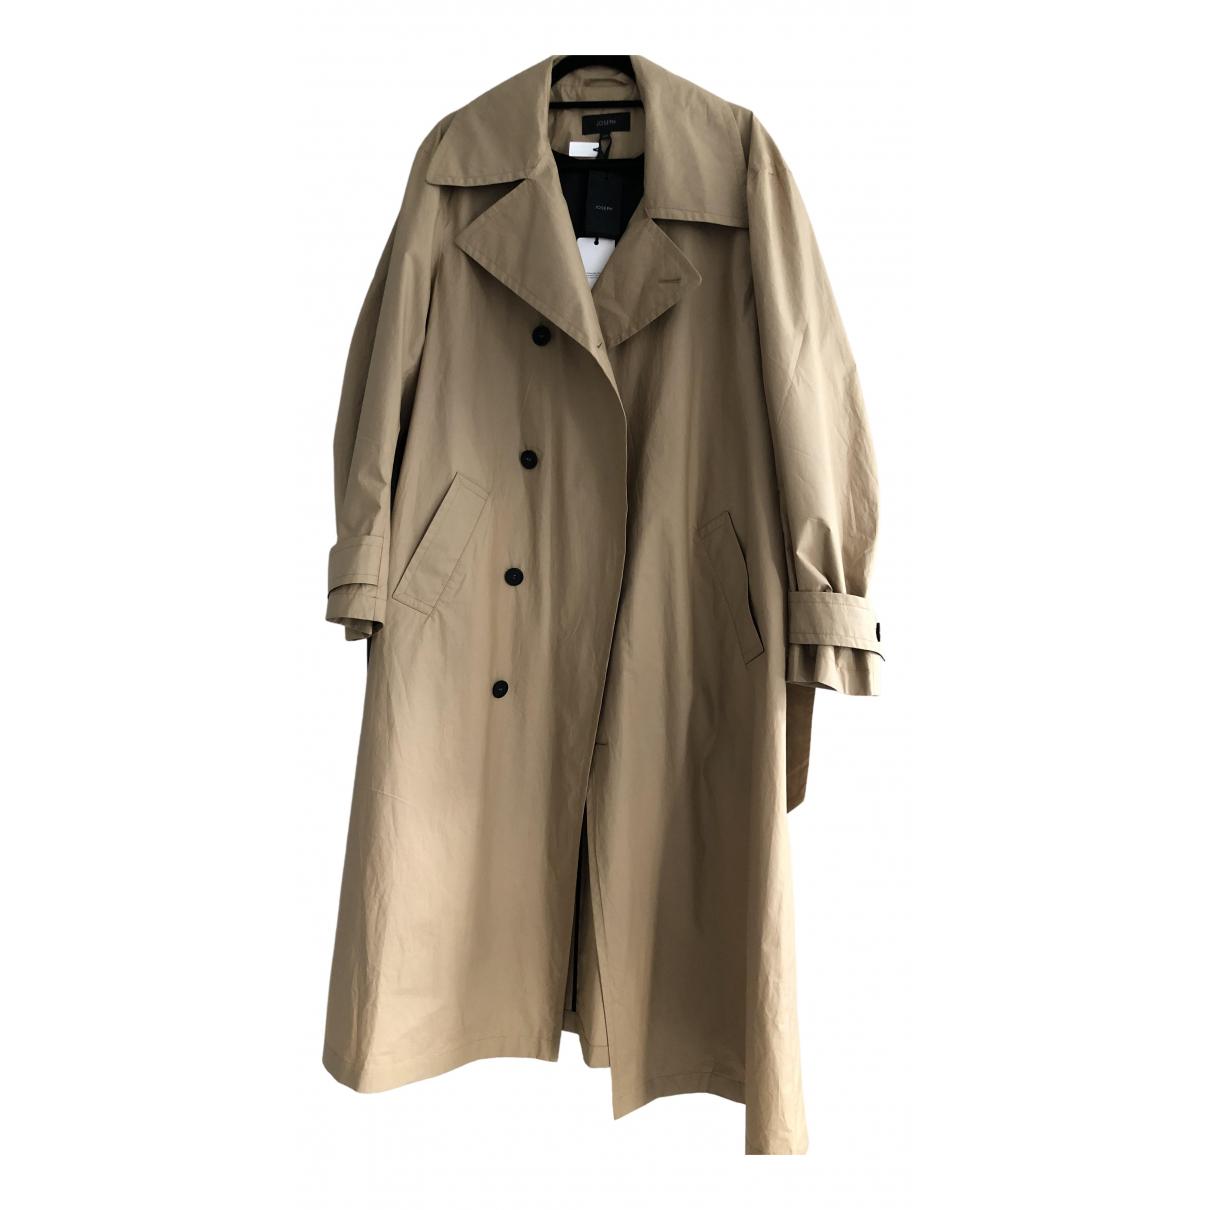 Joseph \N Beige Cotton coat for Women XS International